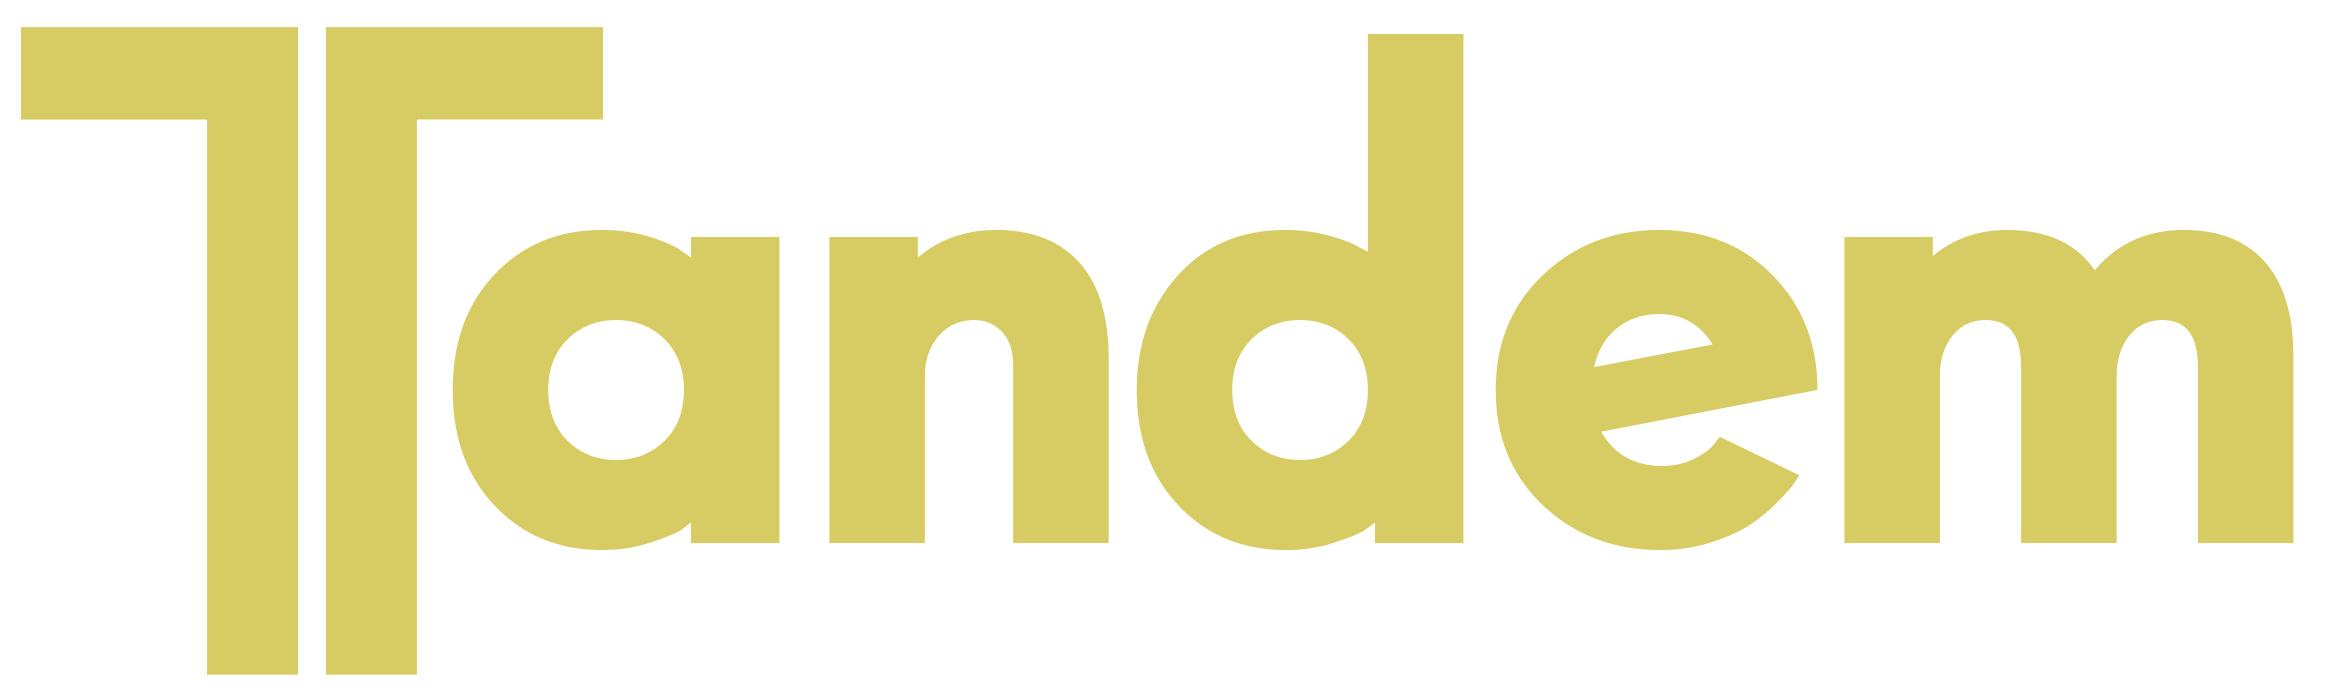 Tandem Logo Yellow.jpg